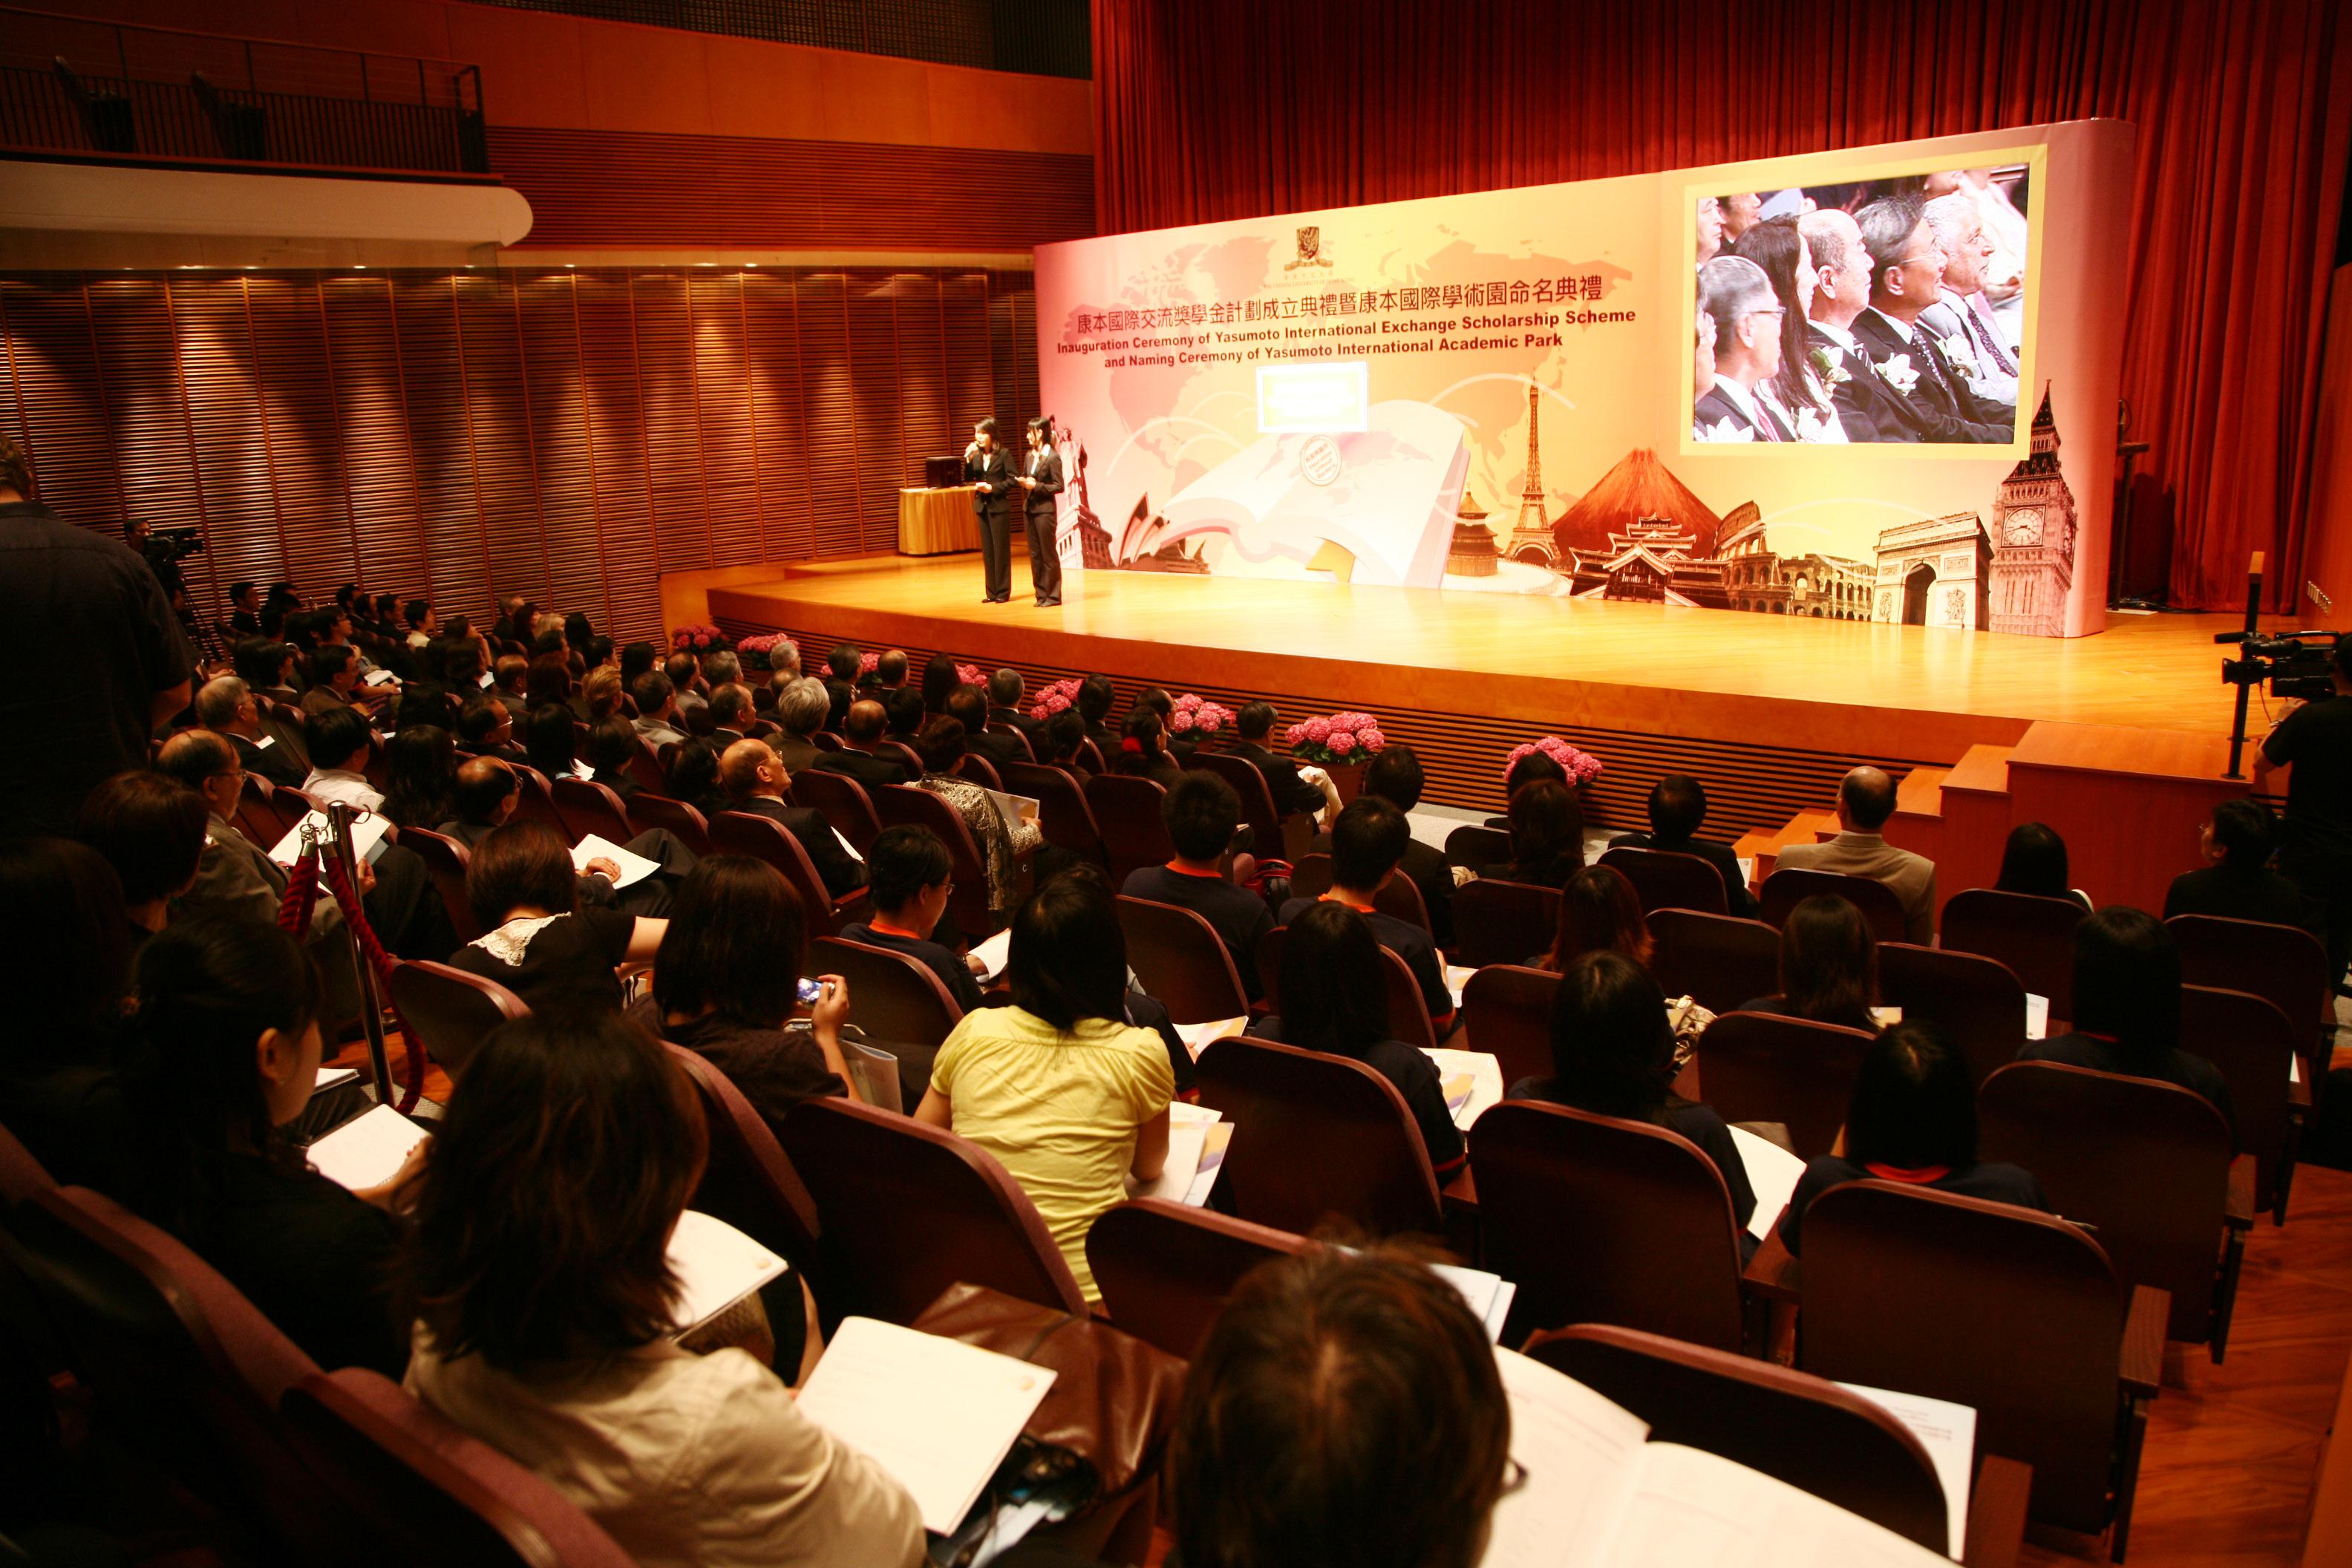 Inauguration of Yasumoto International Exchange Scholarship Scheme and Naming Ceremony of Yasumoto International Academic Park .